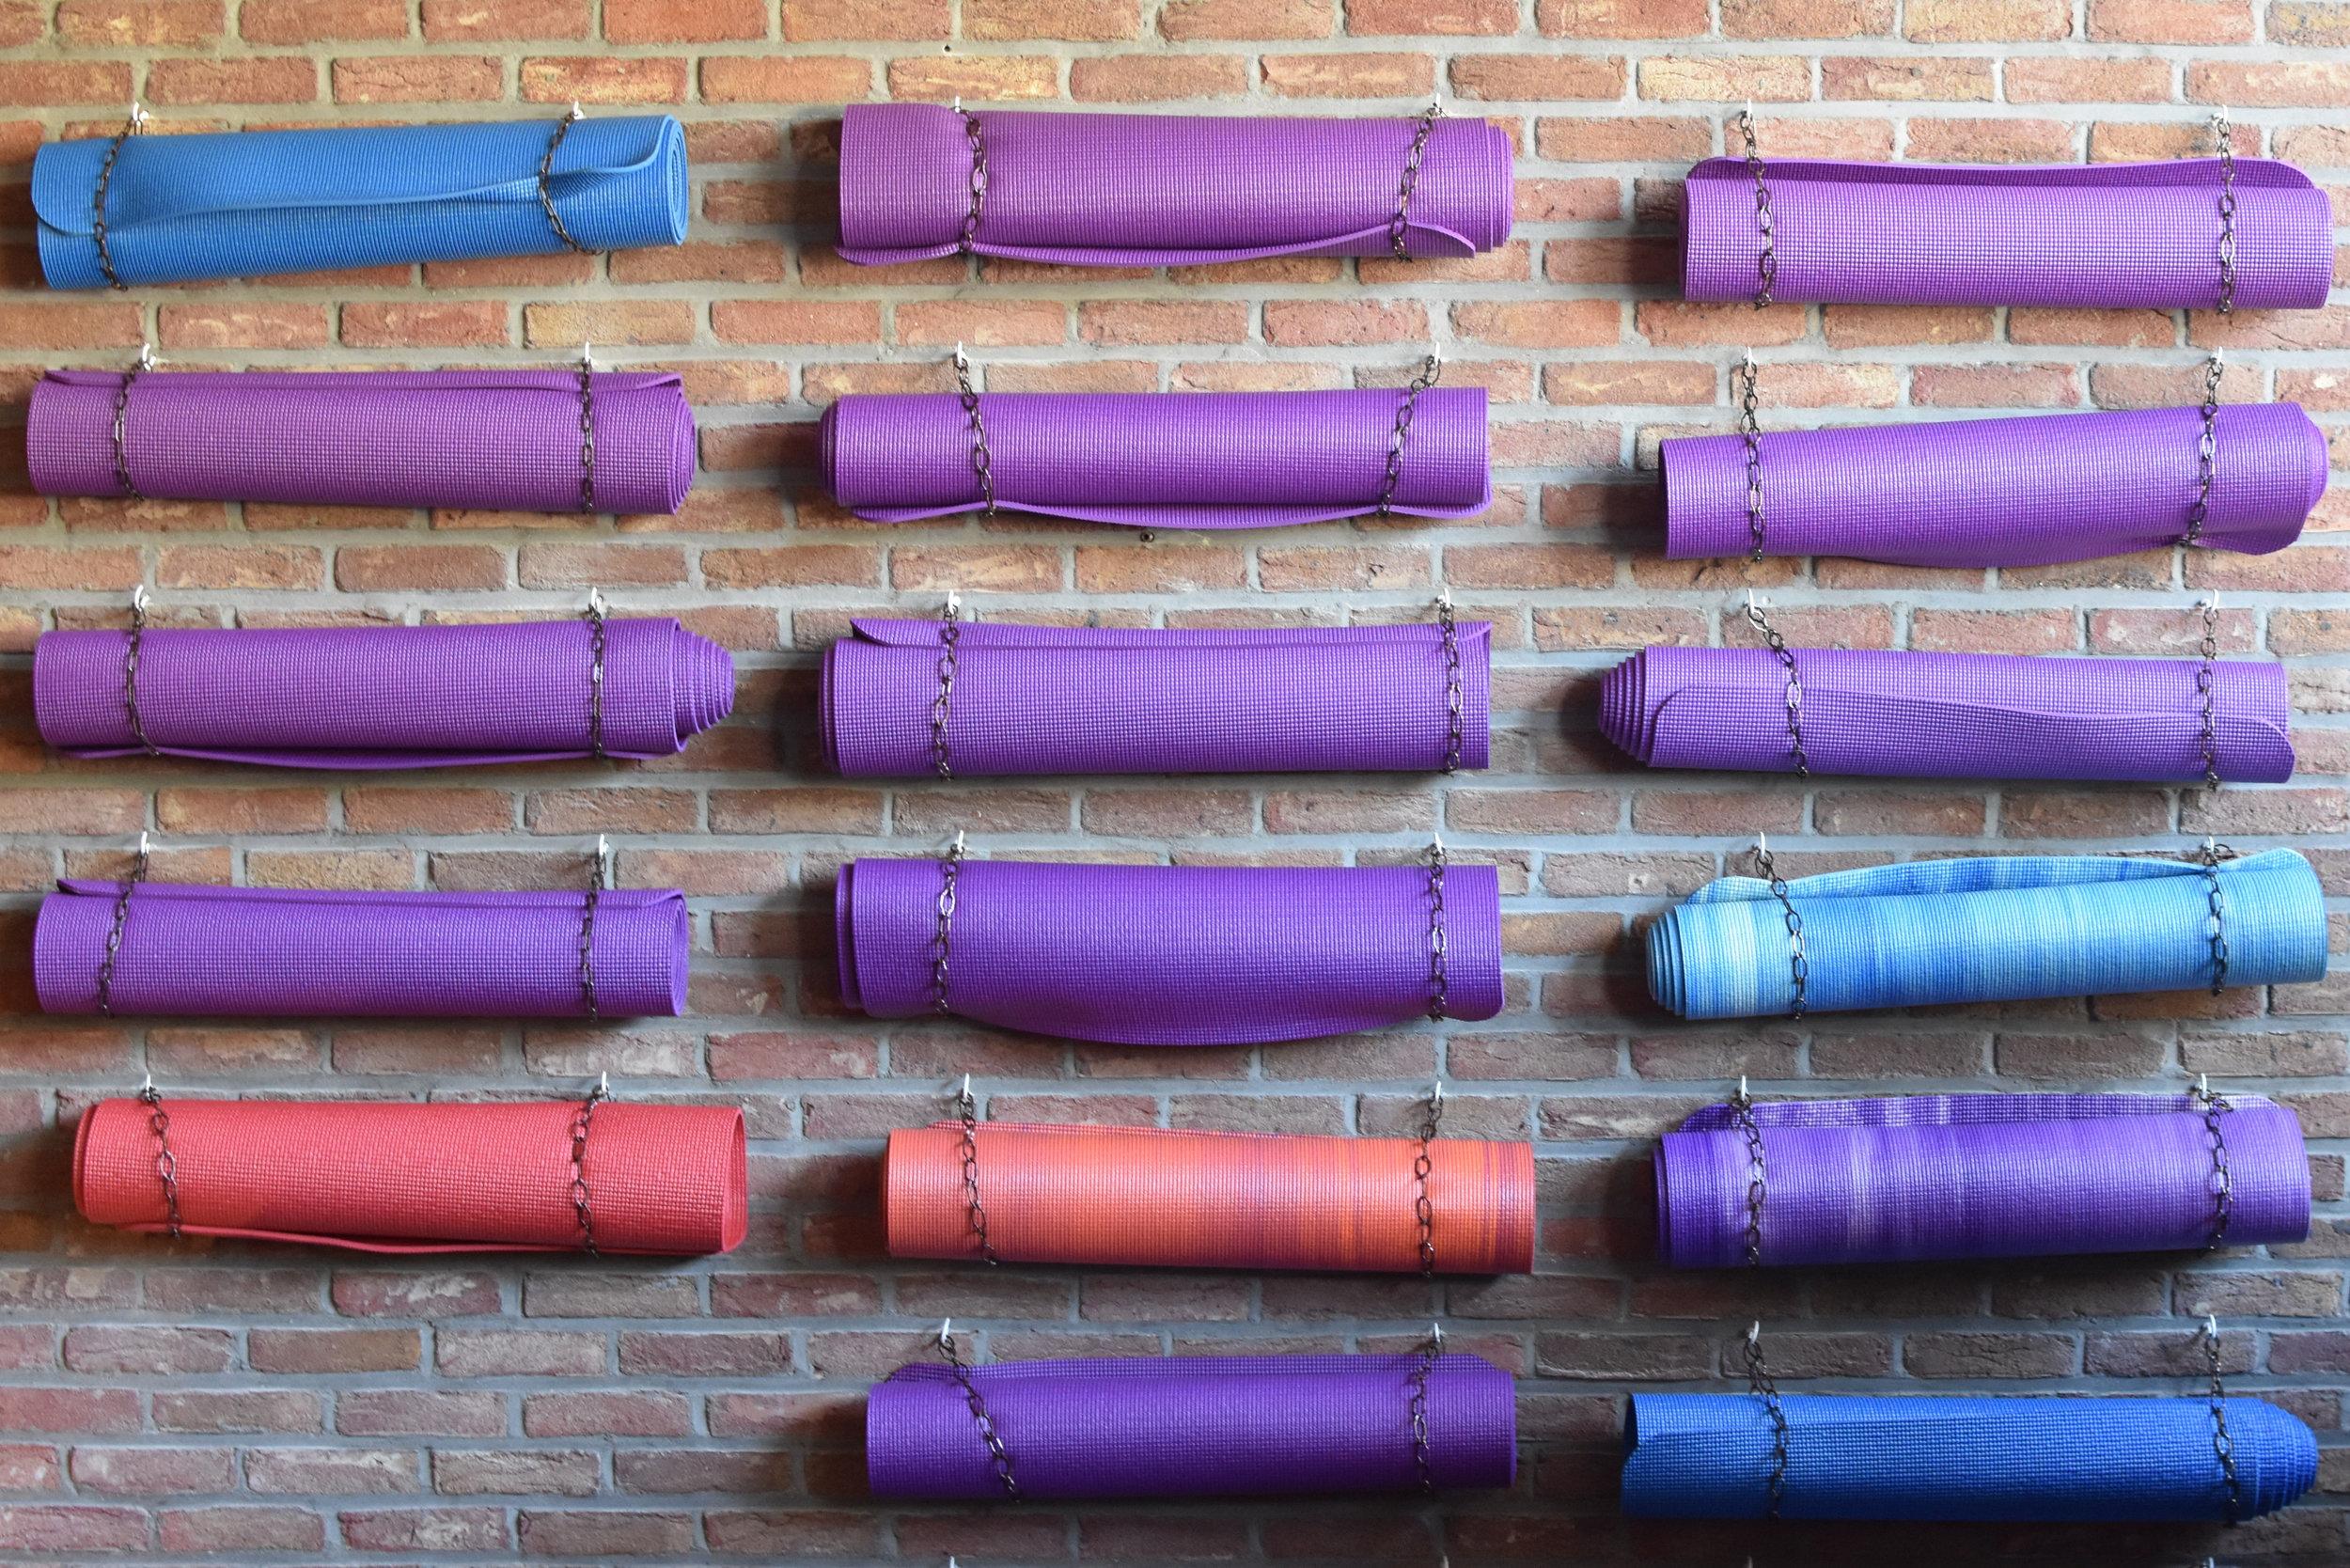 Canva - Yoga Mat, Mats, Colors, Yoga, Wall, Relaxation, Mat (1).jpg